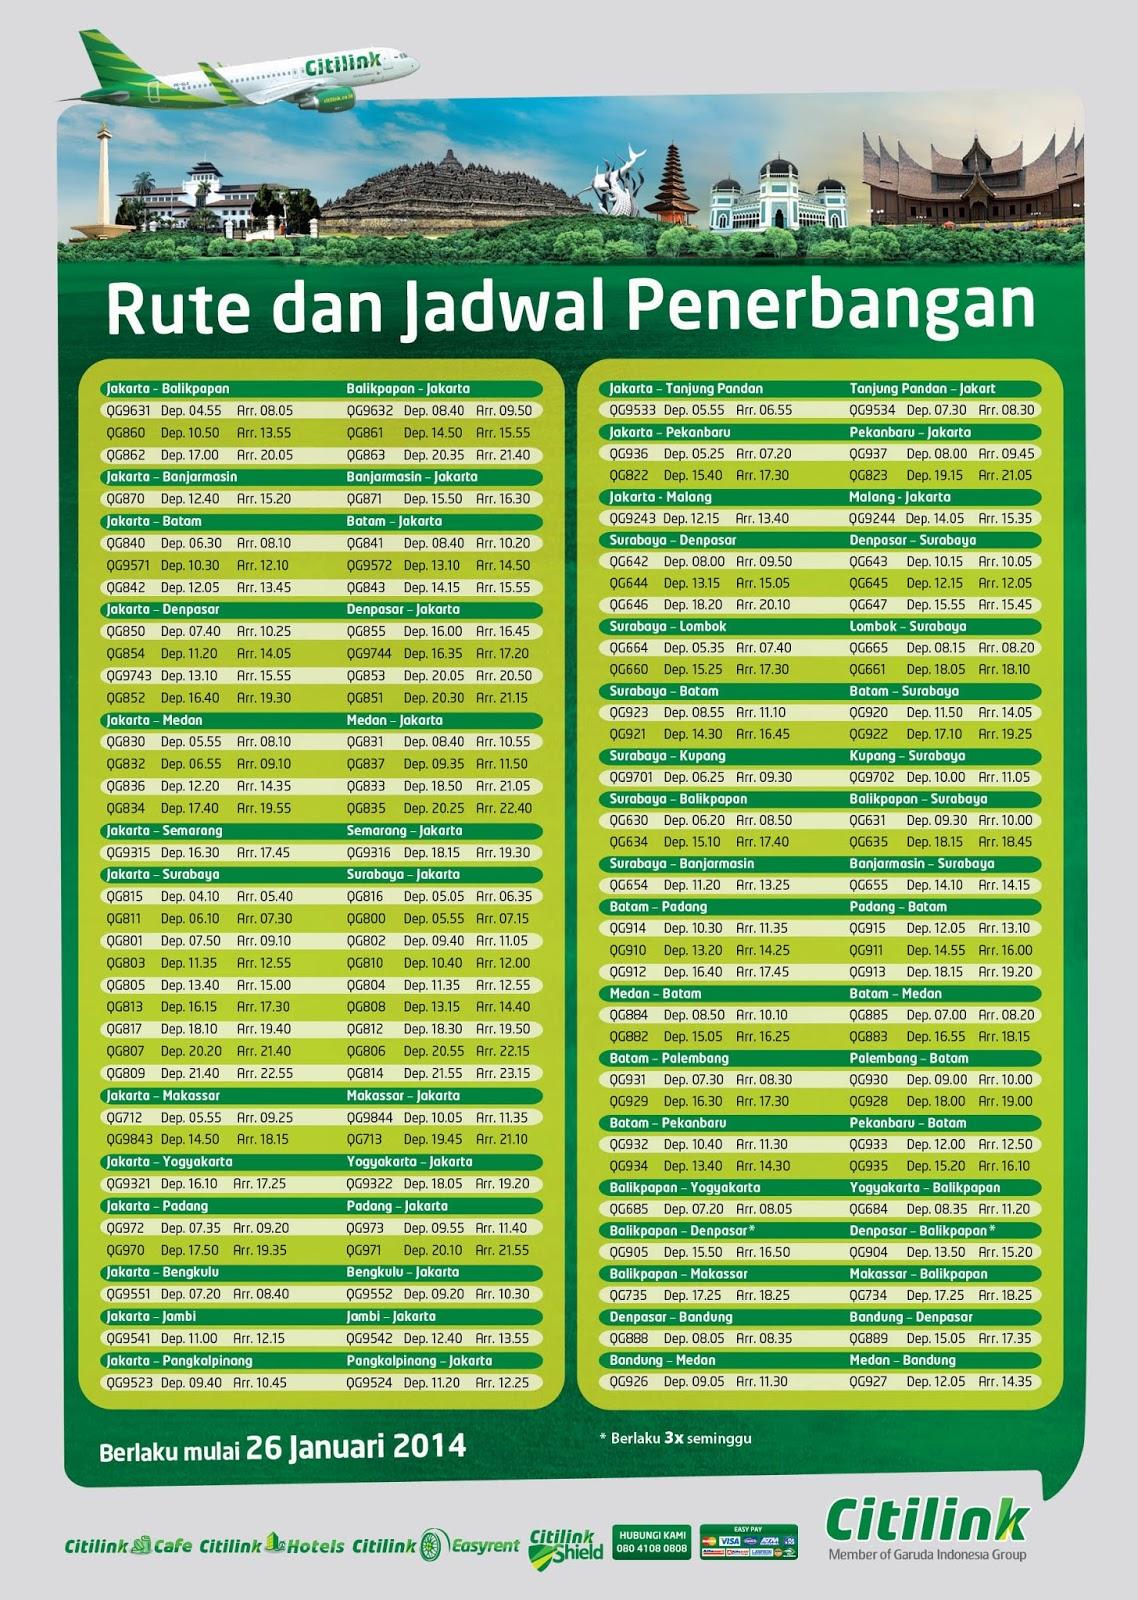 Rute dan Jadwal Penerbangan Citilink